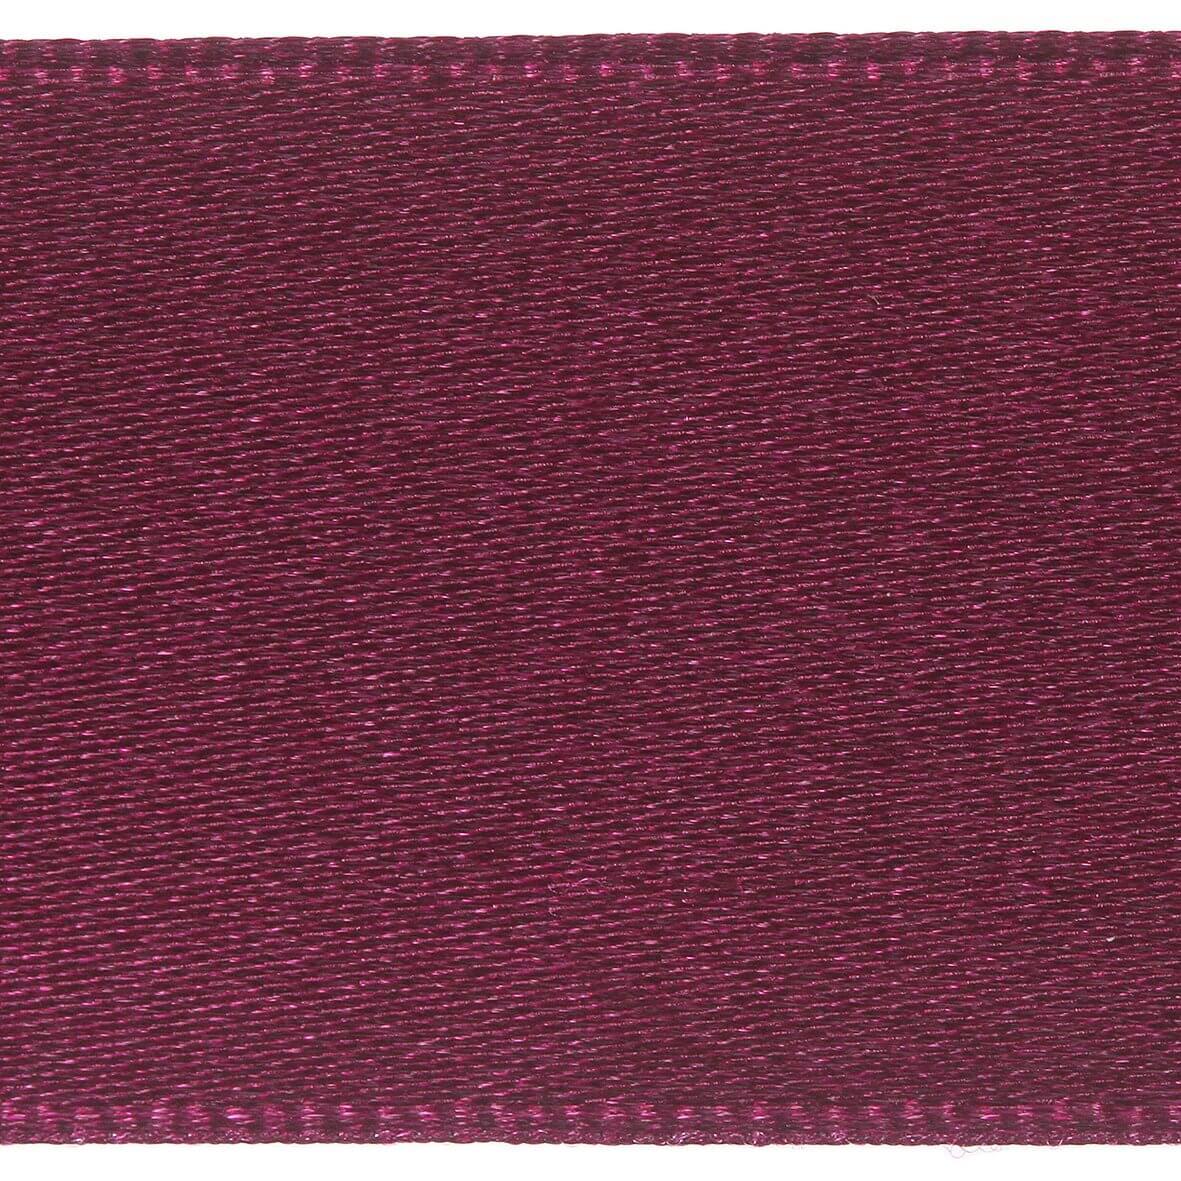 35mm Berisfords Satin Ribbon - Wine Colour 17